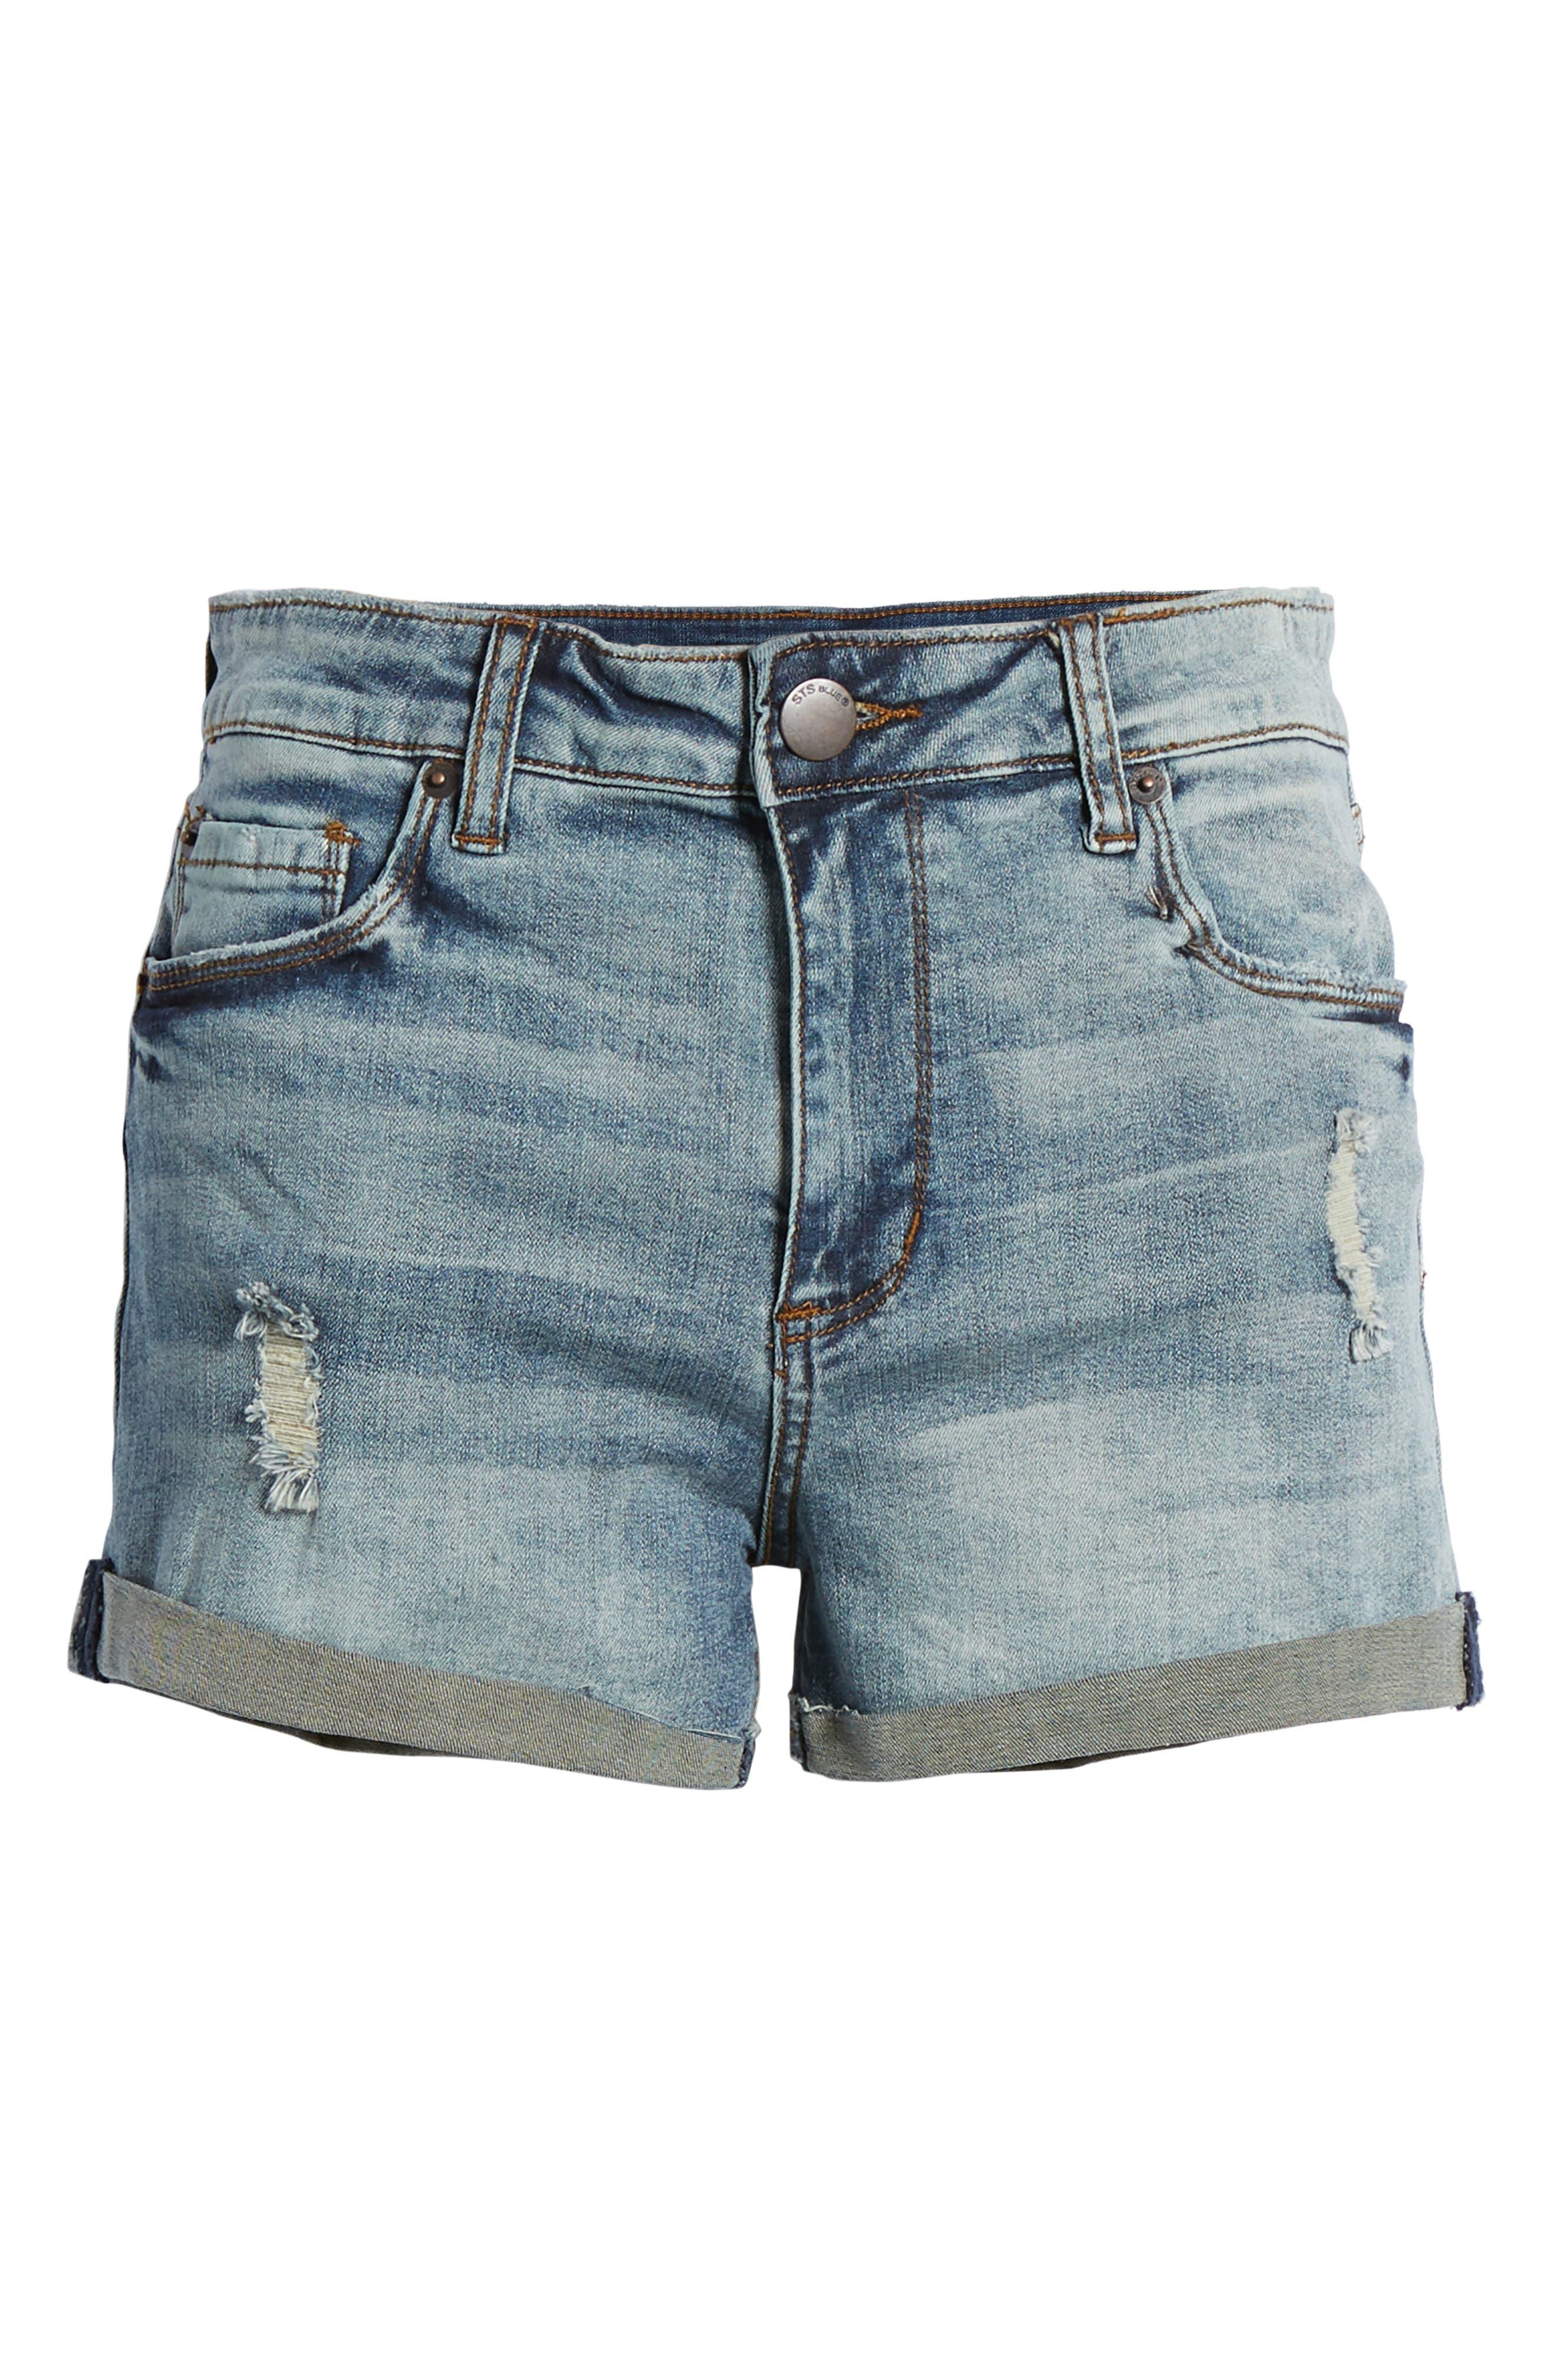 STS Blue Distressed High Waist Denim Shorts,                             Alternate thumbnail 7, color,                             RIVINDEL W/ LT BASE